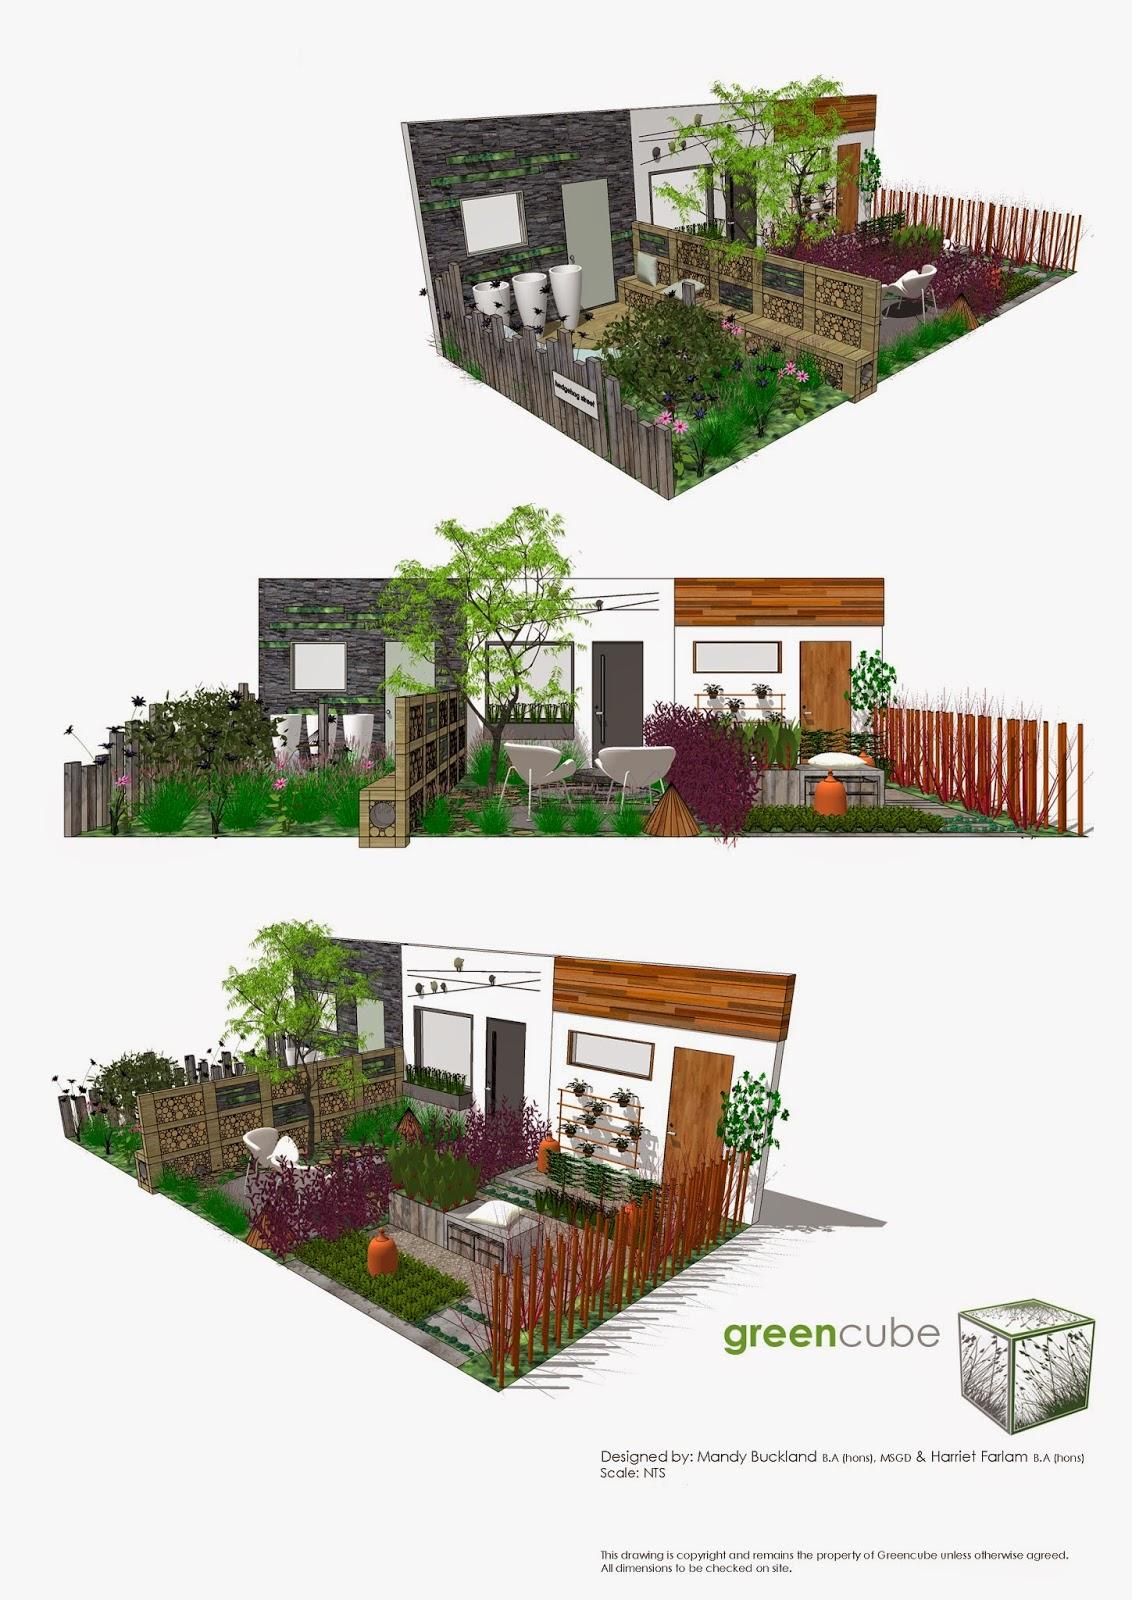 Greencube Garden And Landscape Design, UK: May 2014